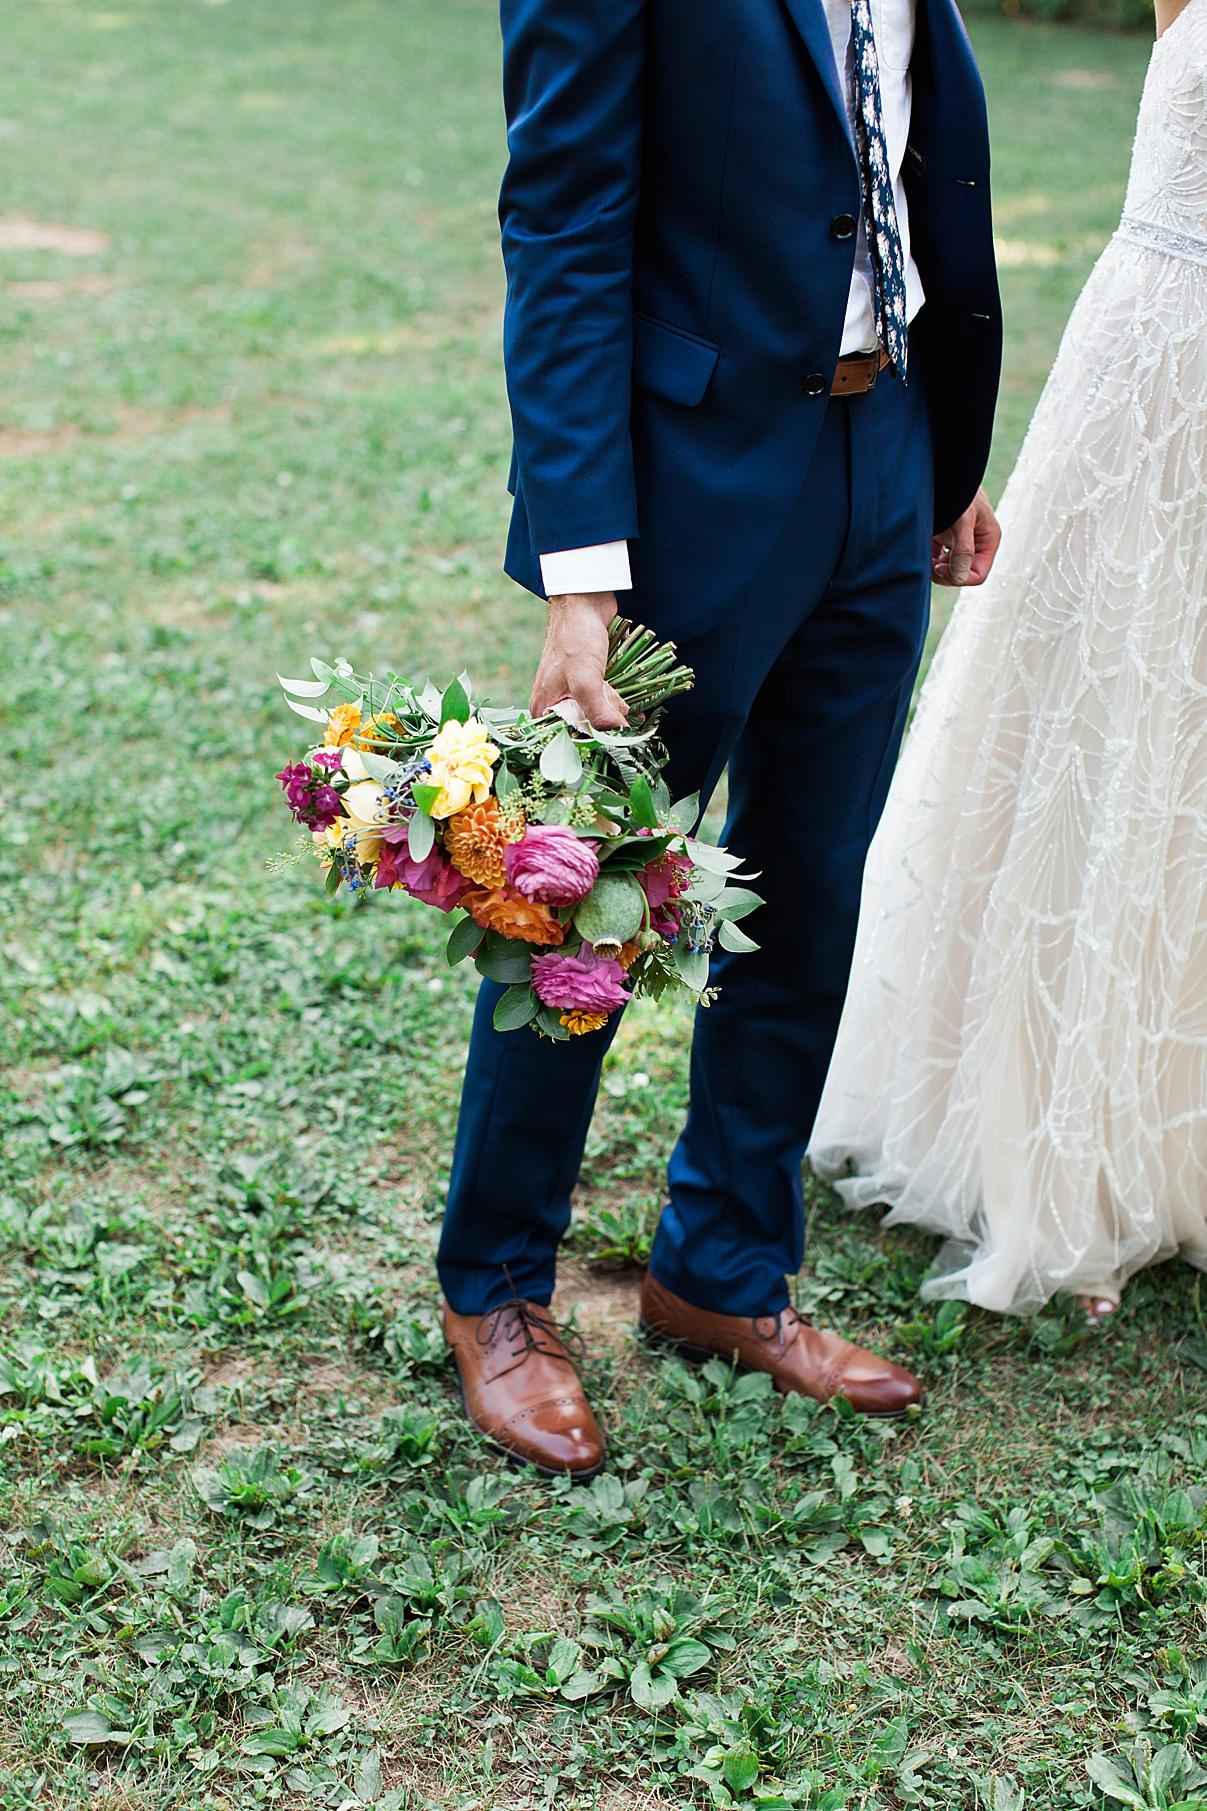 Groom holding bridal bouquet | Balls Falls, Ontario Wedding| Ontario Wedding Photographer| Toronto Wedding Photographer| 3Photography| 3photography.ca